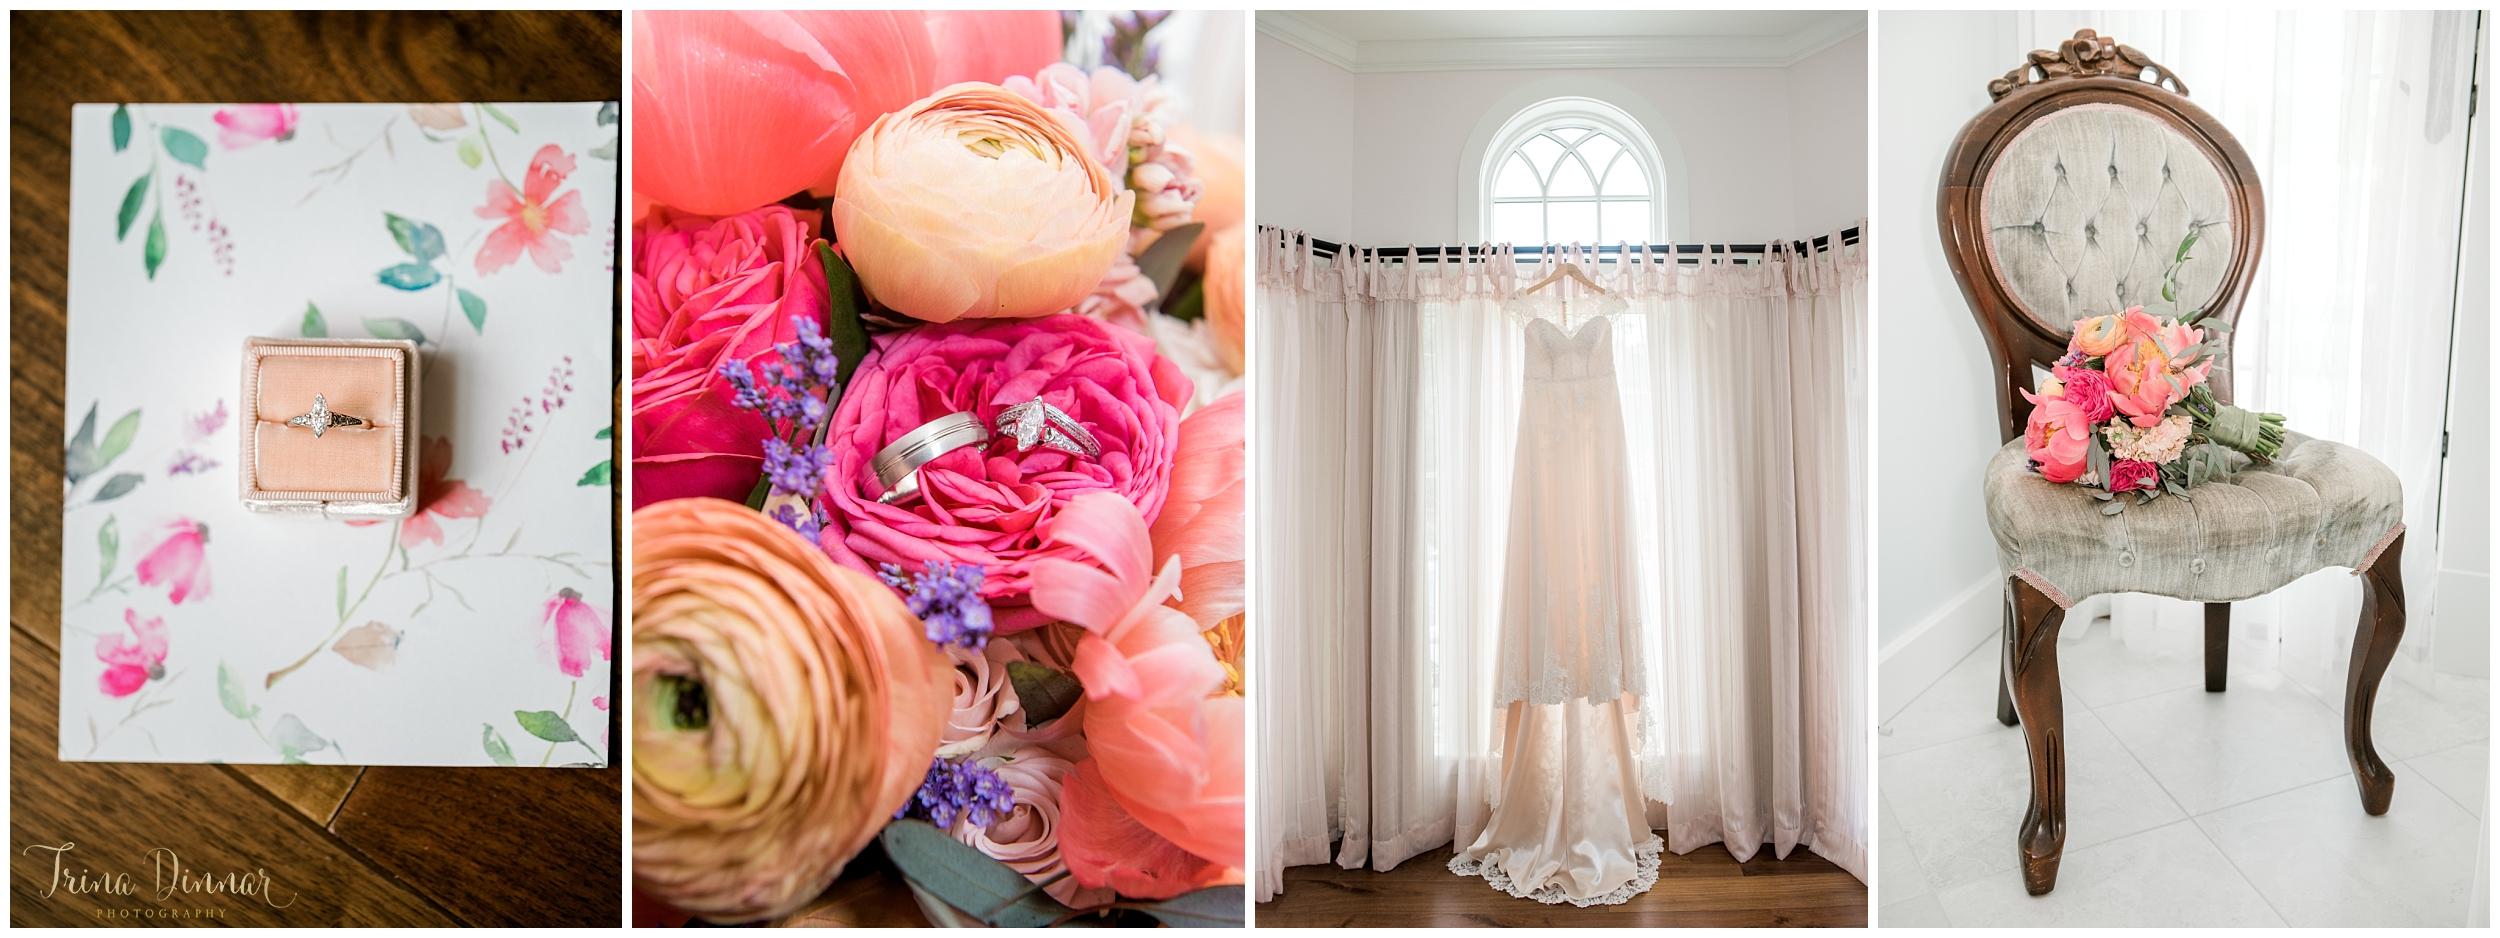 Wedding Photography details by Trina Dinnar.